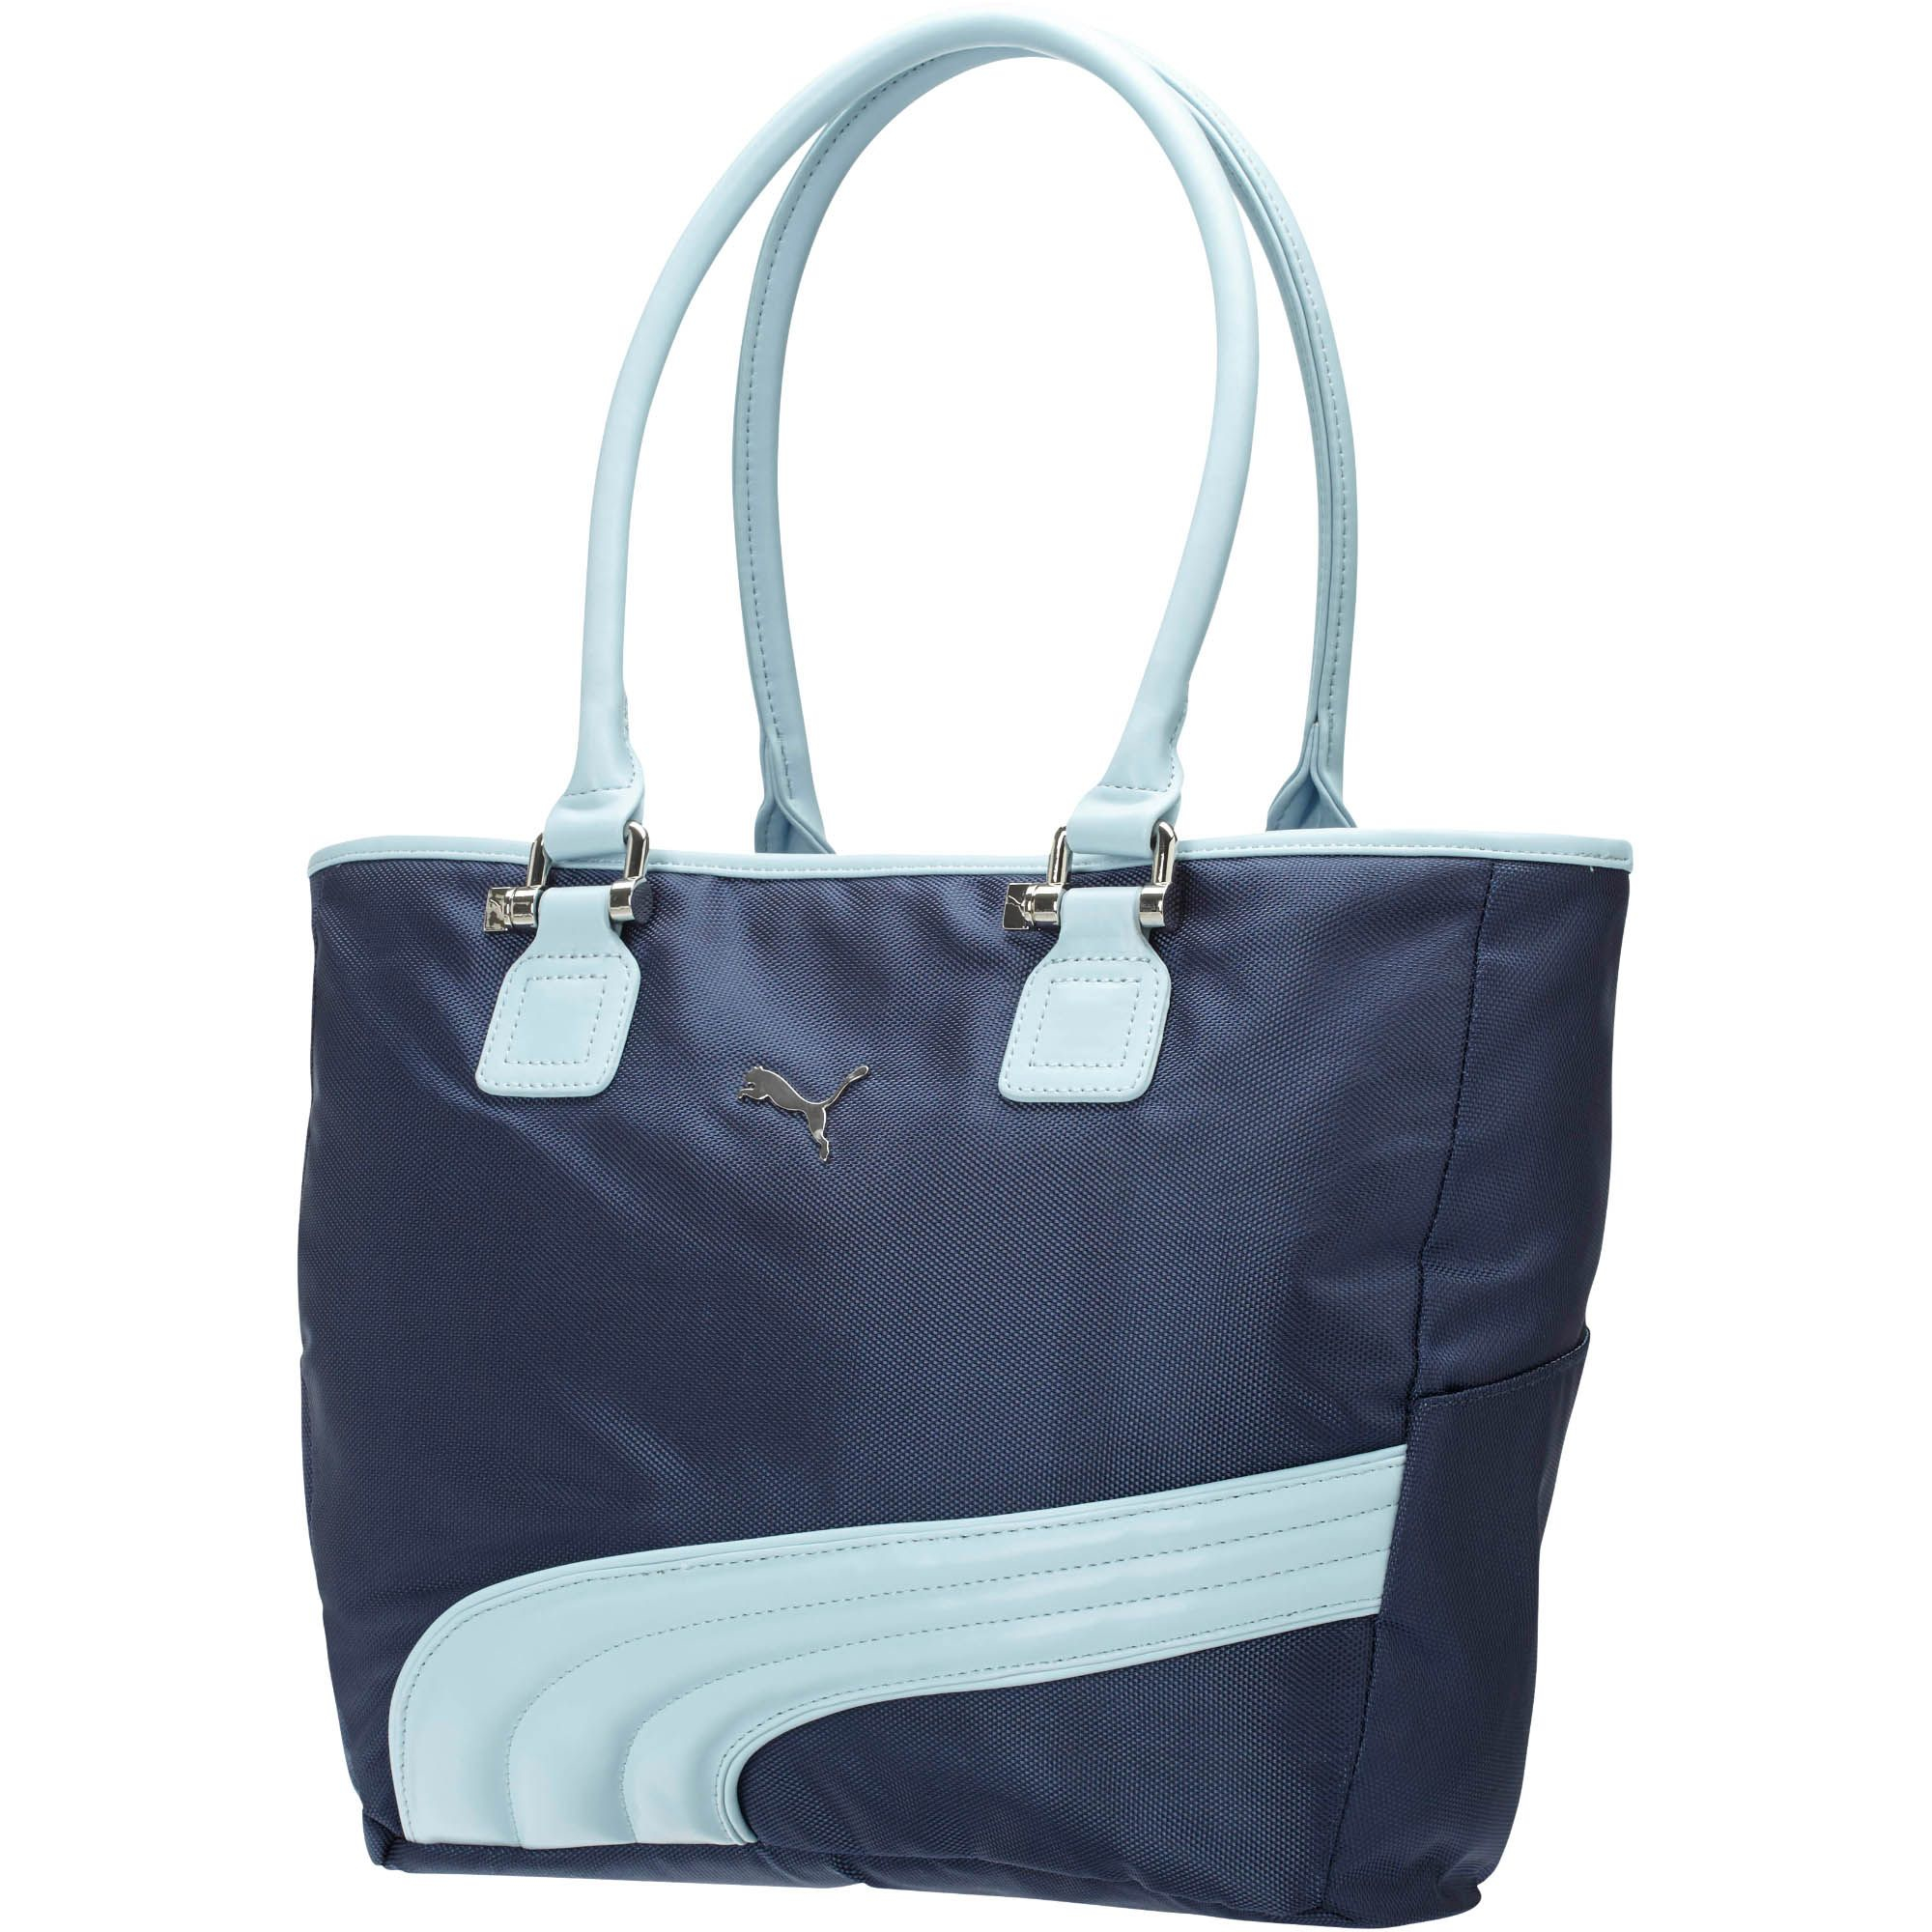 Creative  Bags Luggage Handbags Clutches Handbags Puma Women Red Tote Bag